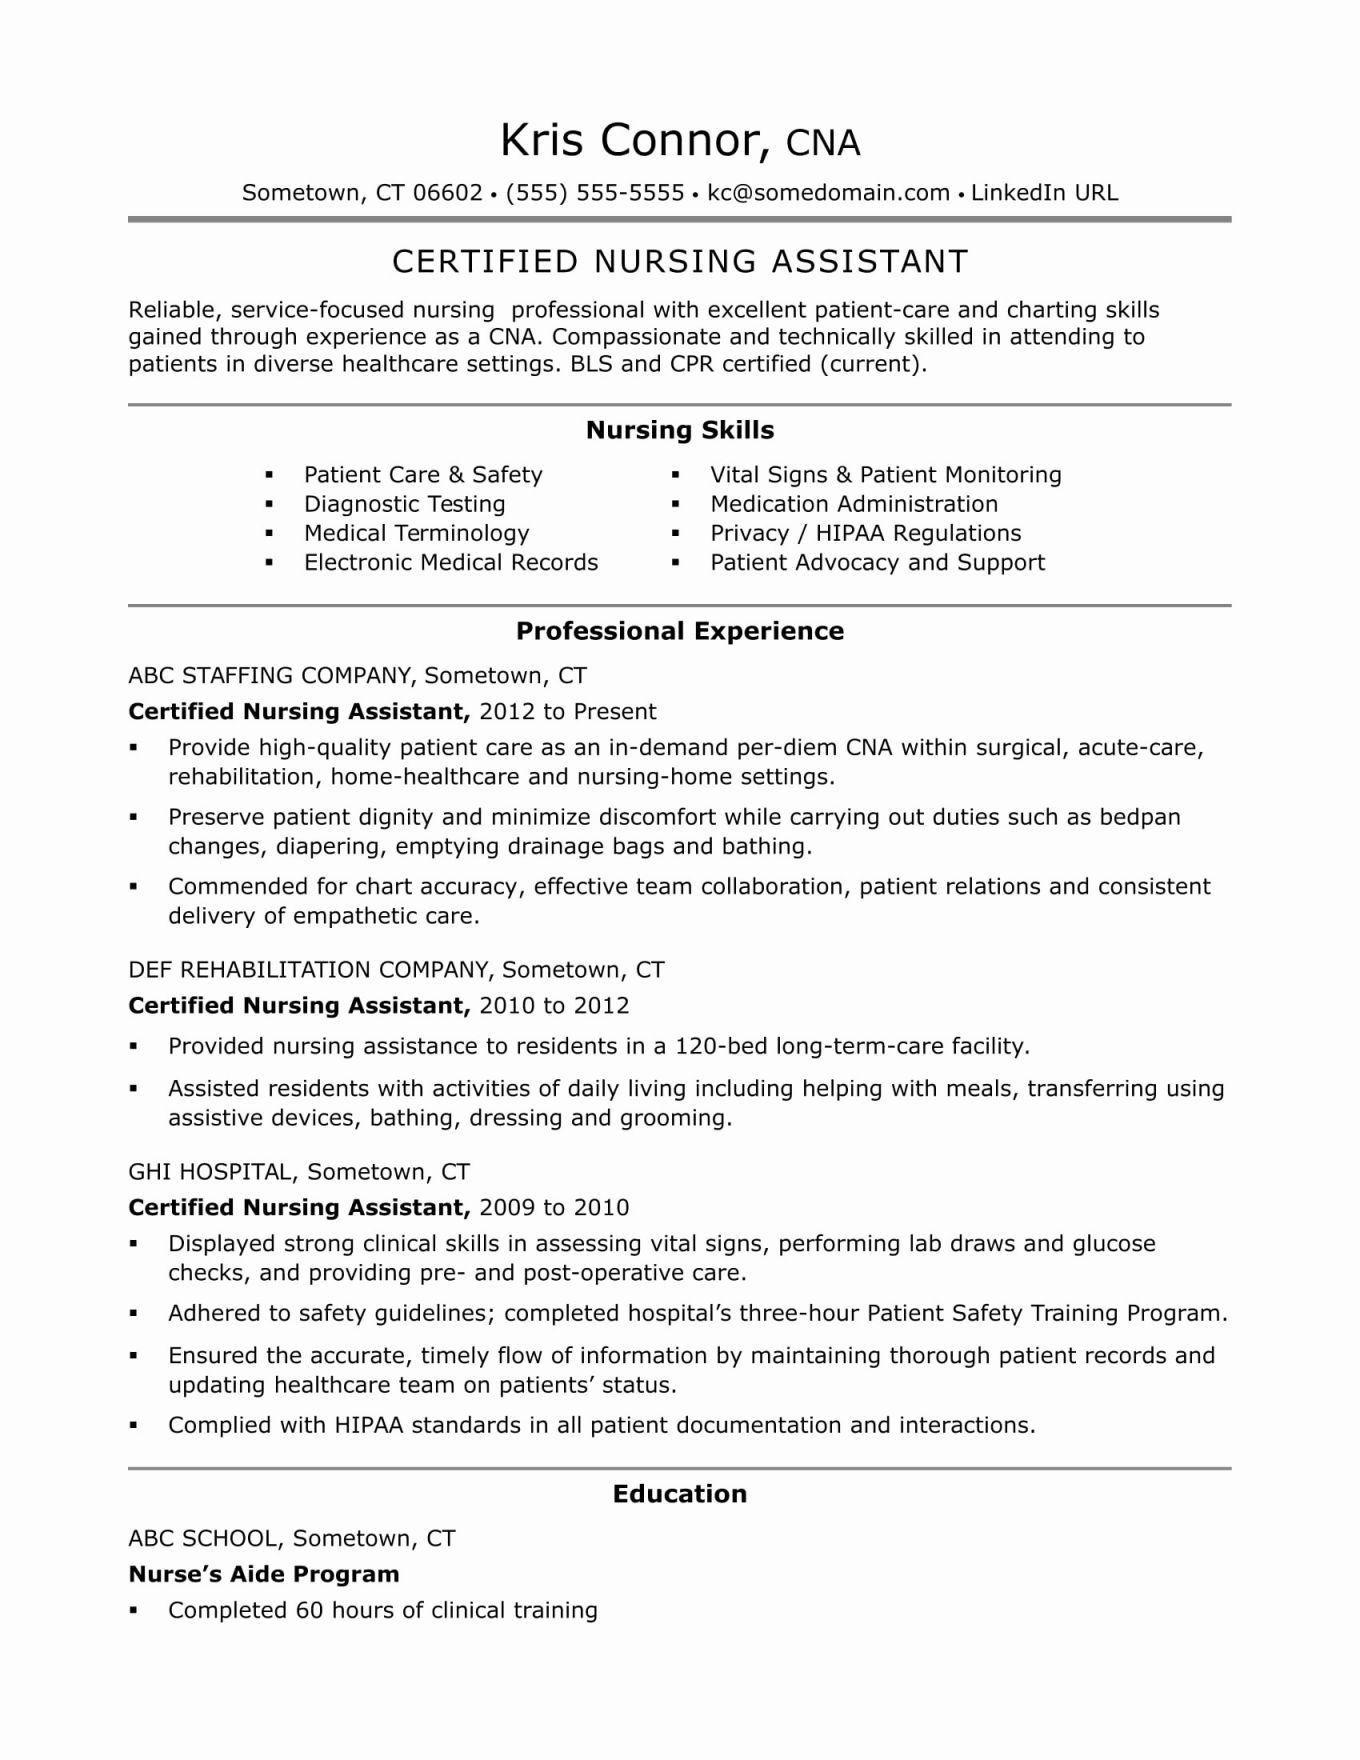 Generalclassified medical terminology worksheet